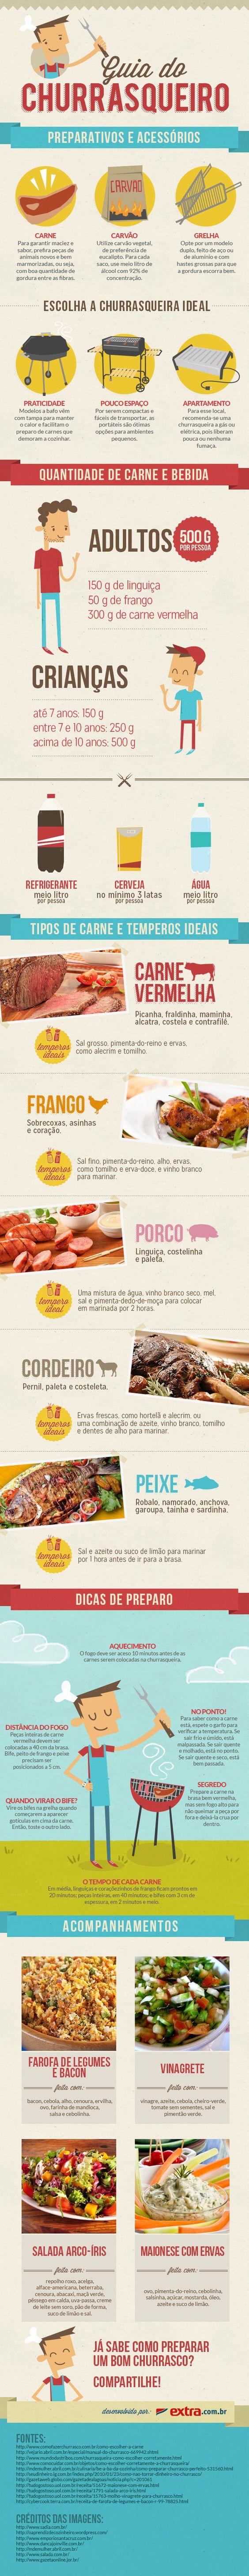 Infográfico – Guia definitivo do churrasco perfeito: